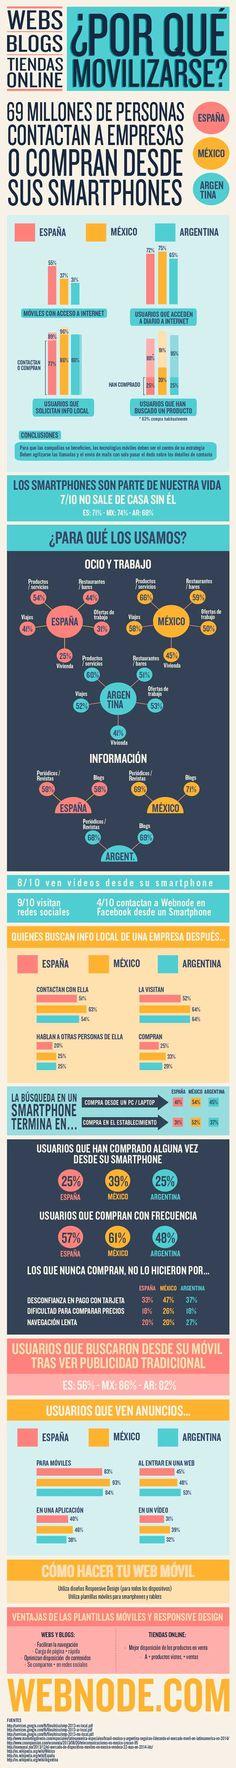 Infografía mostrando la importancia de adaptar una web al mundo móvil. #tecnologia #infografia